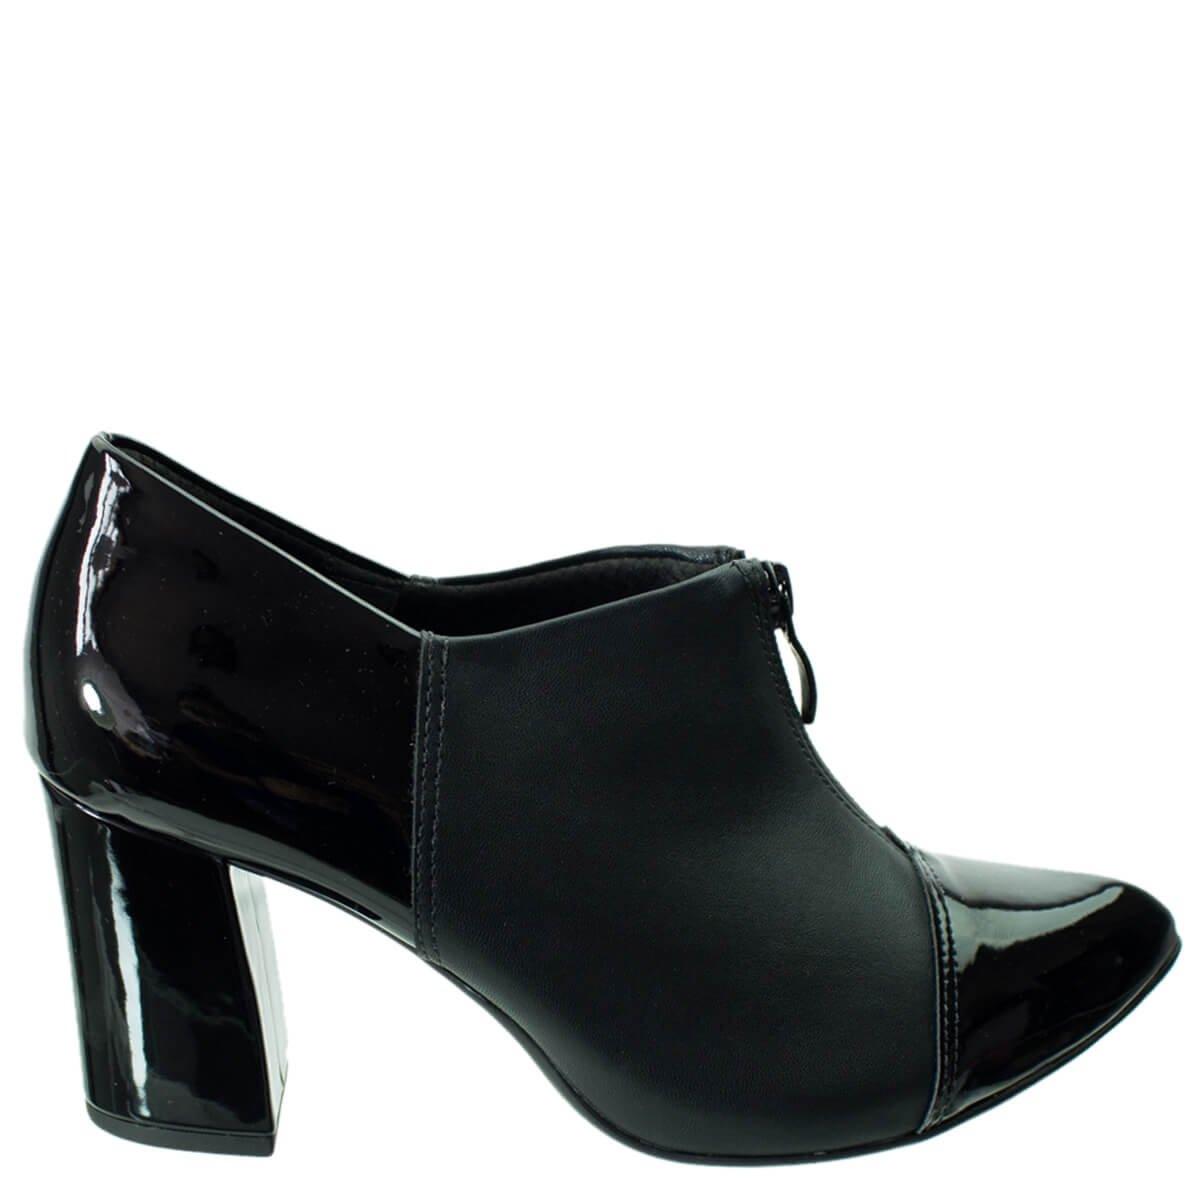 bb3d055e20 Bizz Store - Ankle Boot Feminina Piccadilly Salto Grosso